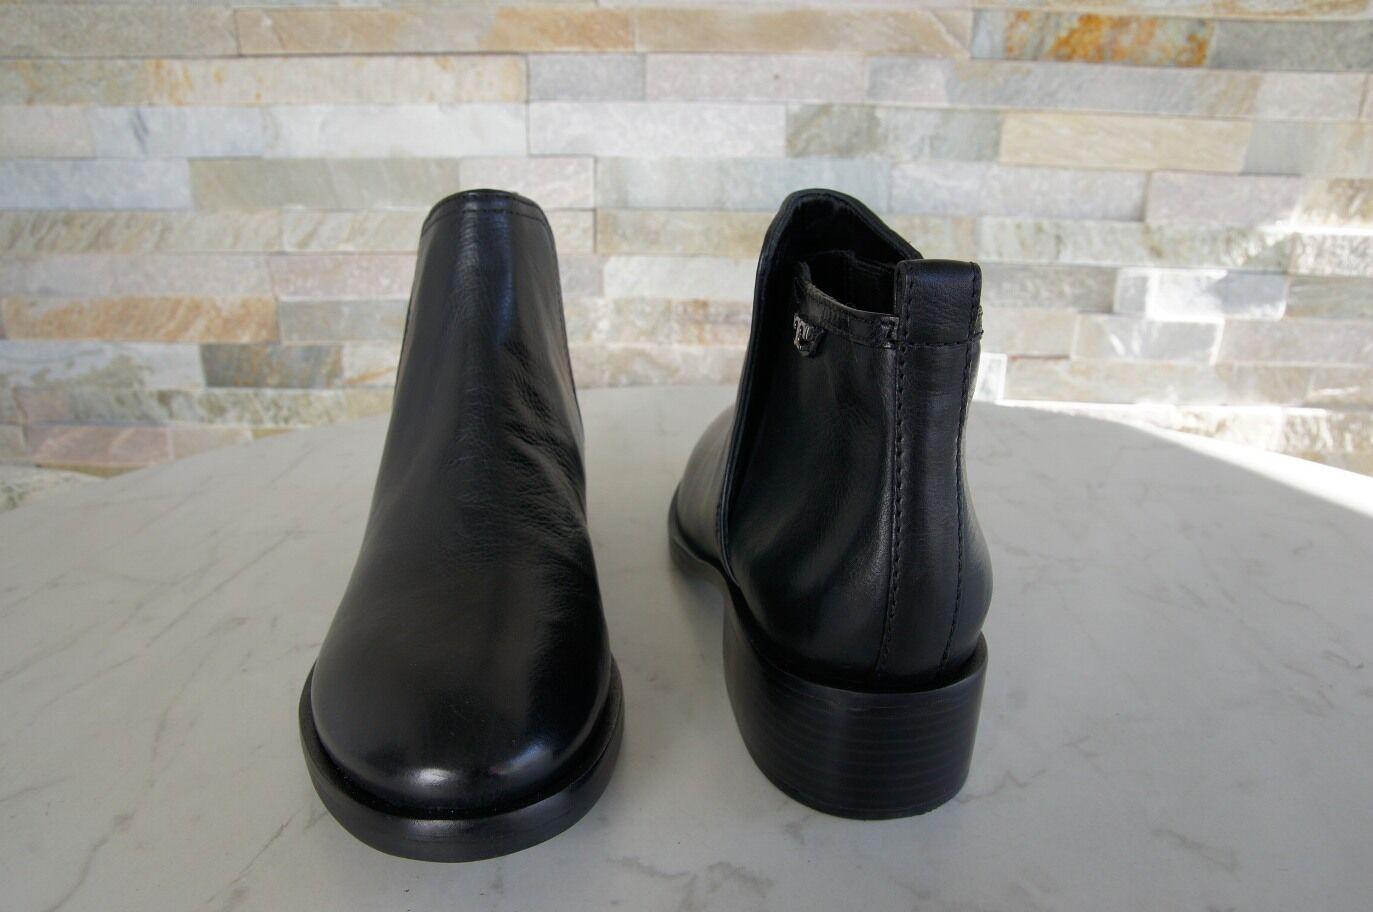 TORY BURCH Gr schuhe 36 6 Stiefeletten Schuhe schuhe Gr 31148341 schwarz nero NEU 855f9e